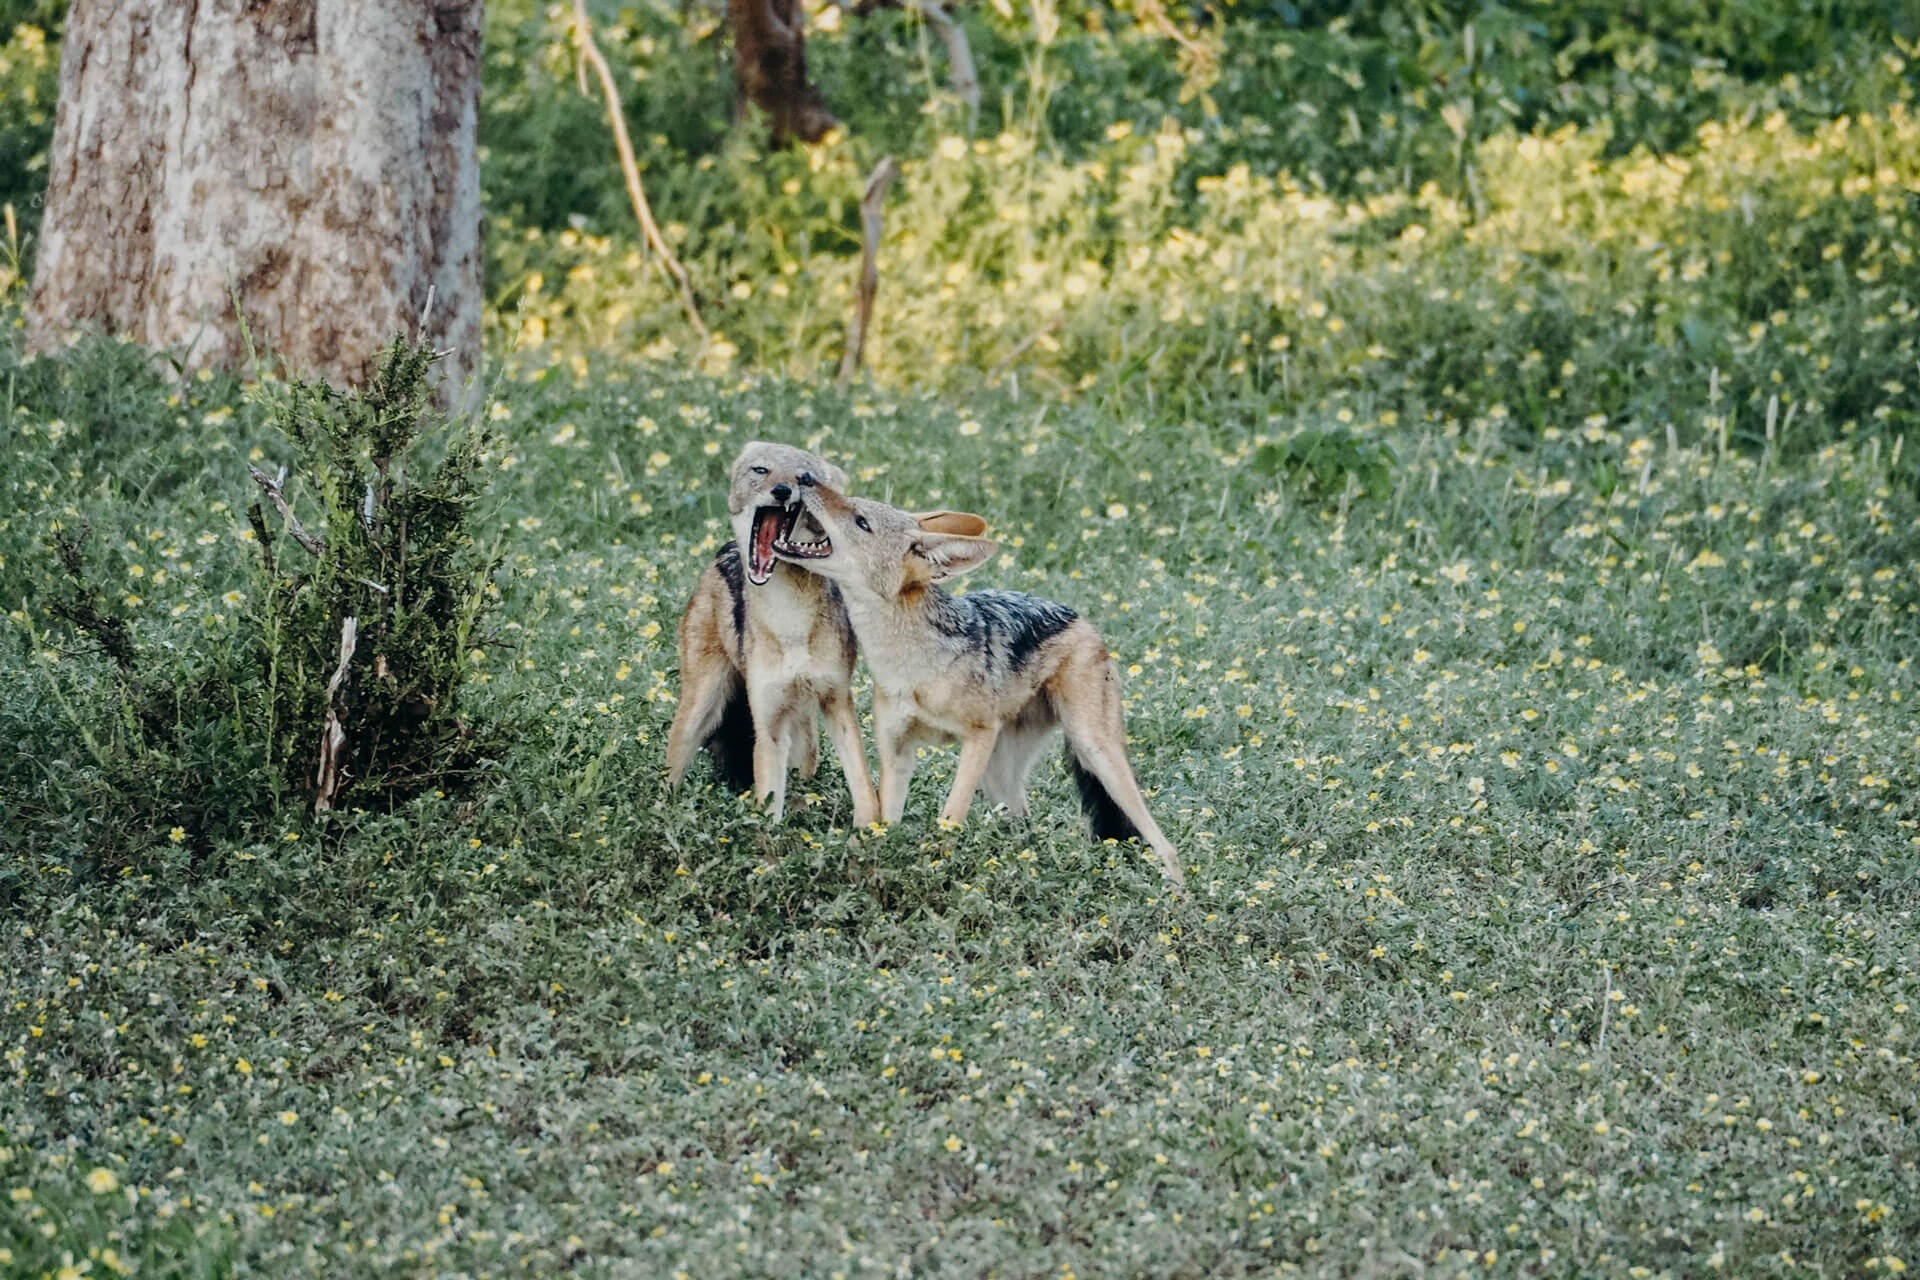 Blacked-backed jackals